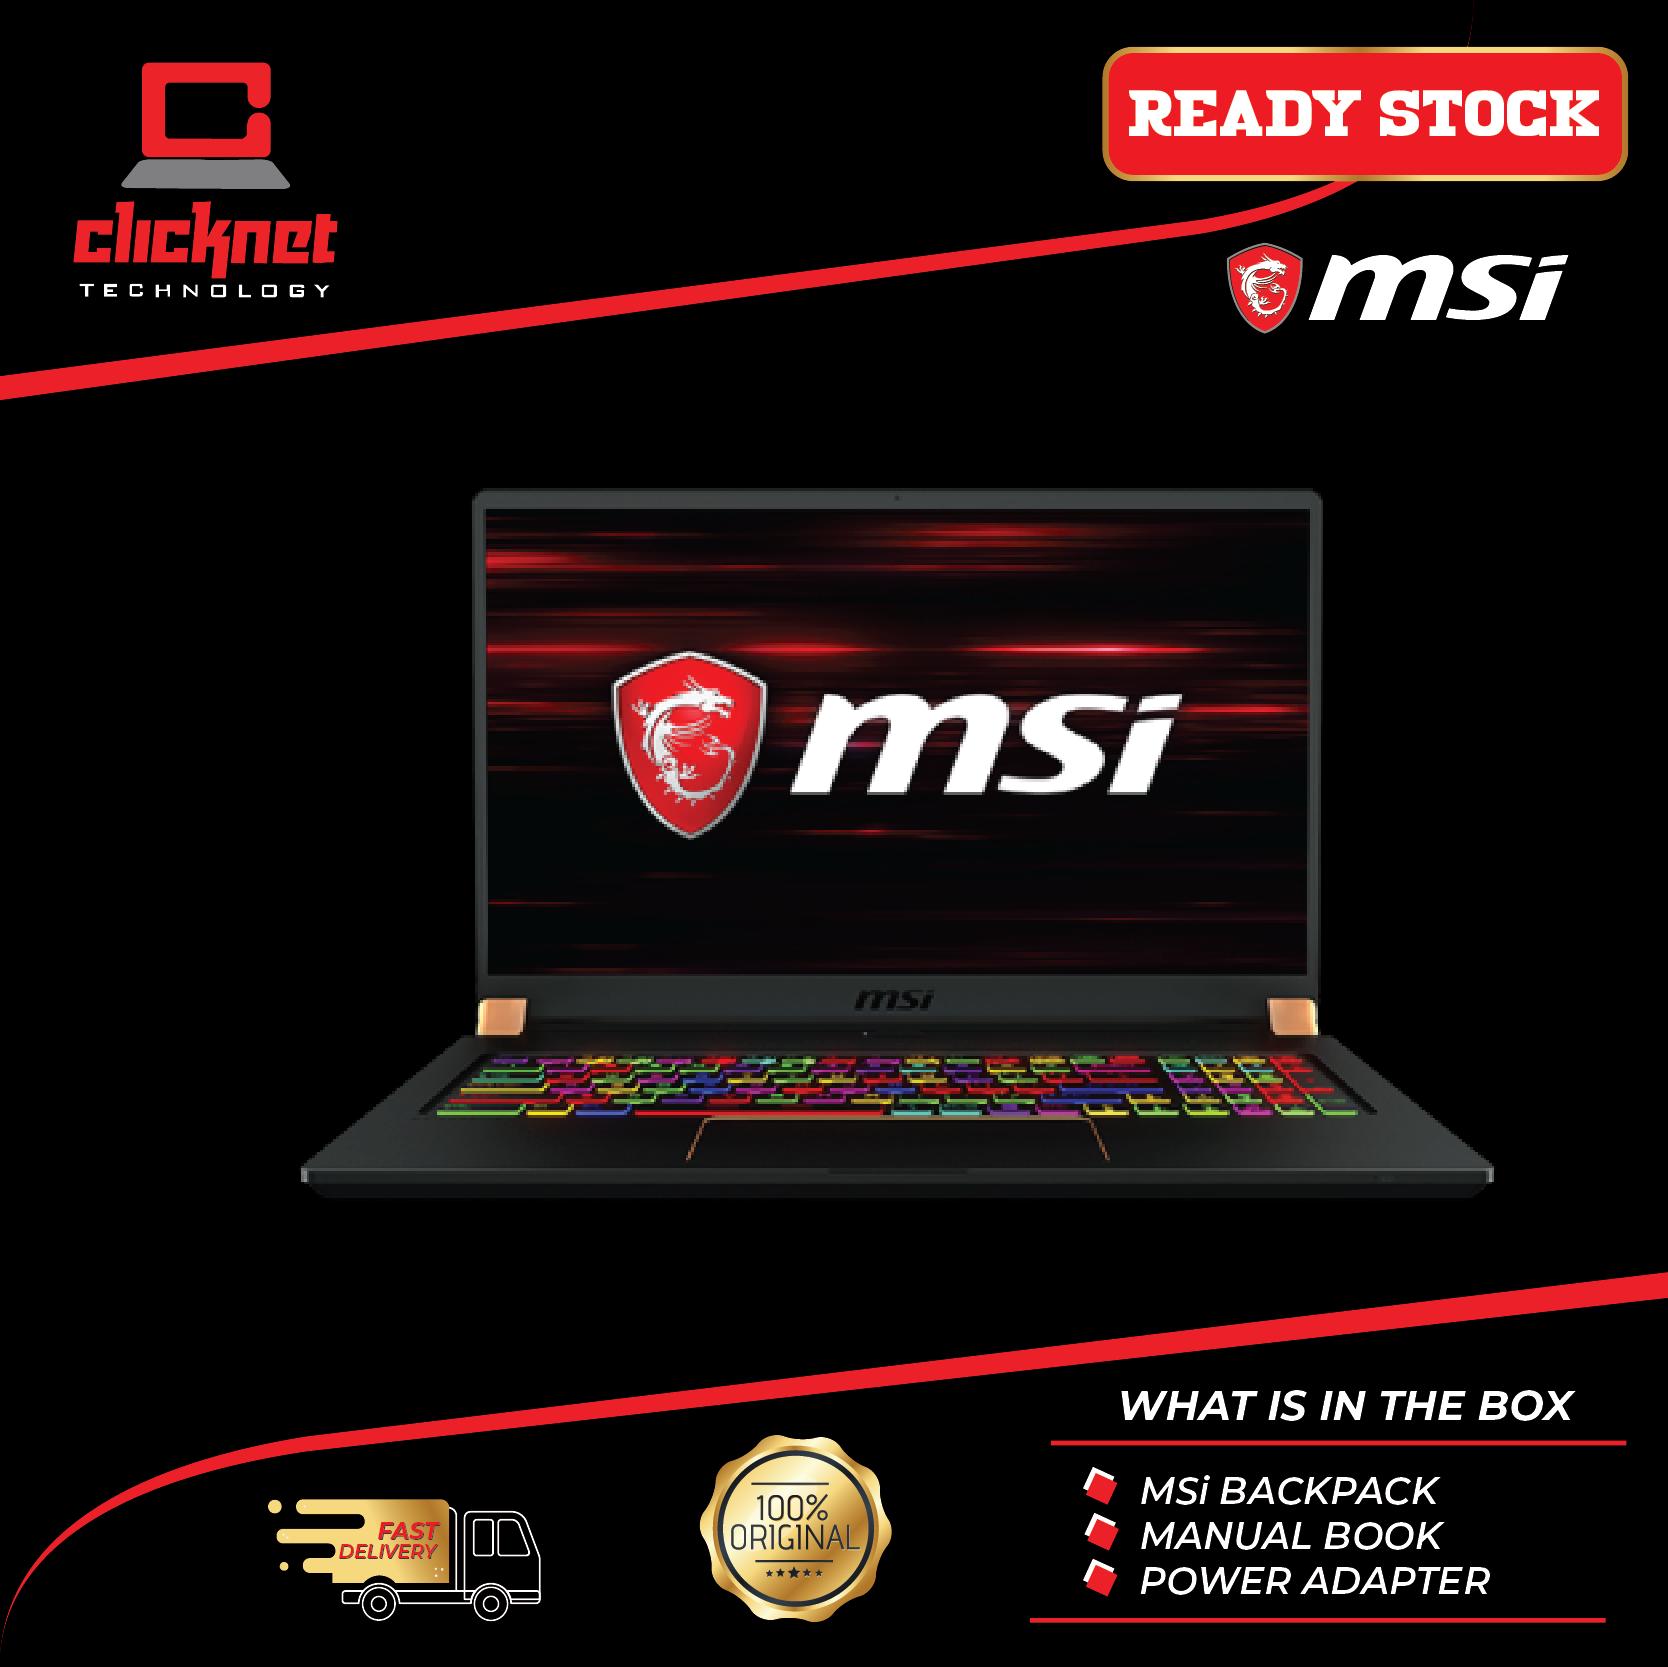 MSI GS75-9SE-471 17.3  FHD IPS 144Hz Gaming Laptop (i7-9750HQ 16GB 1TB SSD RTX 2060 6GB 17.3FHD W10) Malaysia